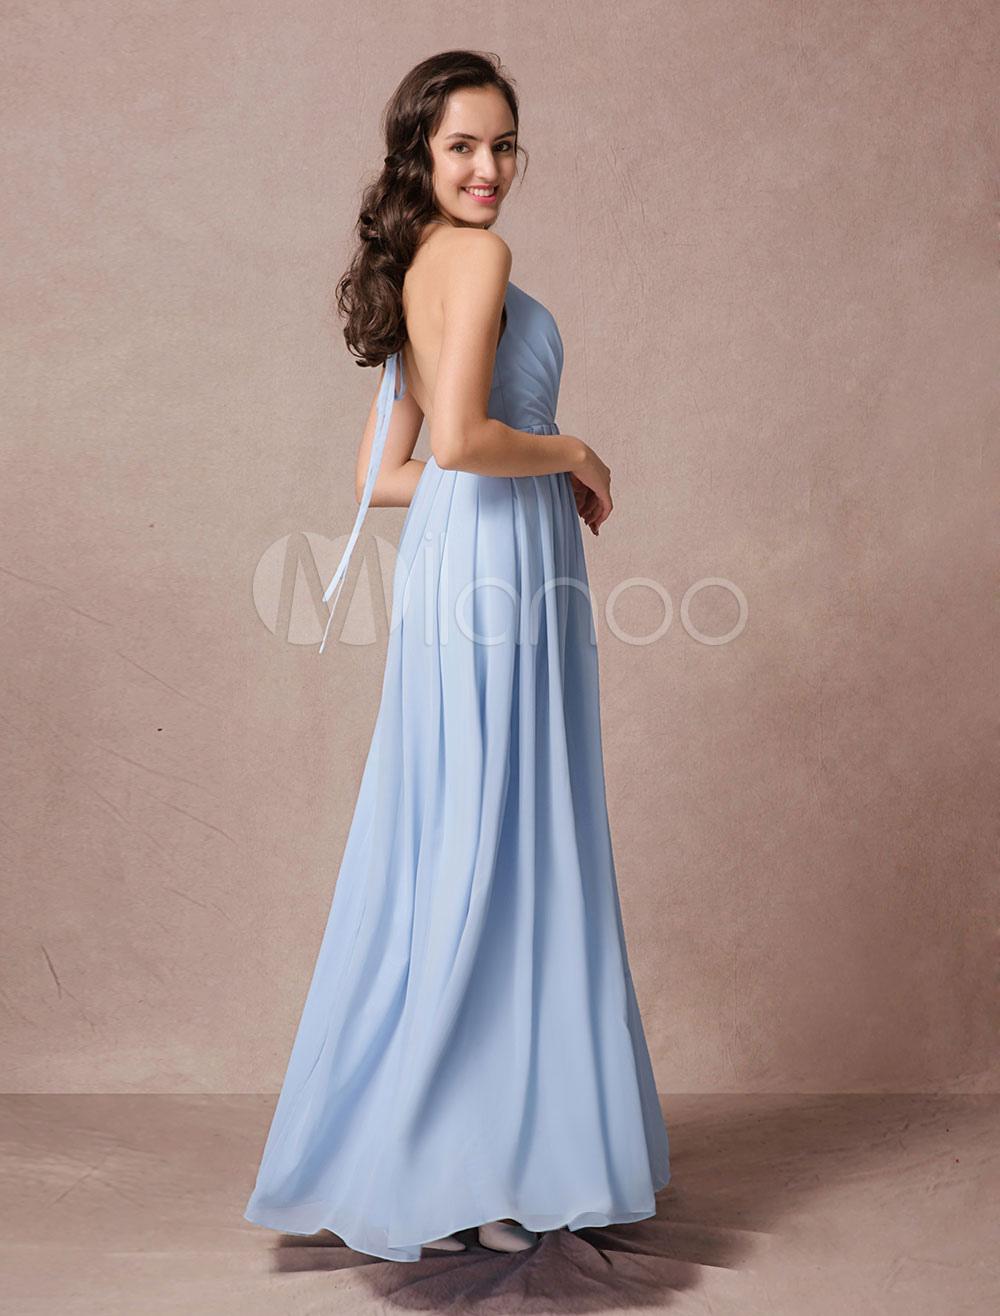 Cheap bridesmaid dresses 2017 discount bridesmaid dress cheap bridesmaid dresses 2017 discount bridesmaid dress milanoo ombrellifo Image collections